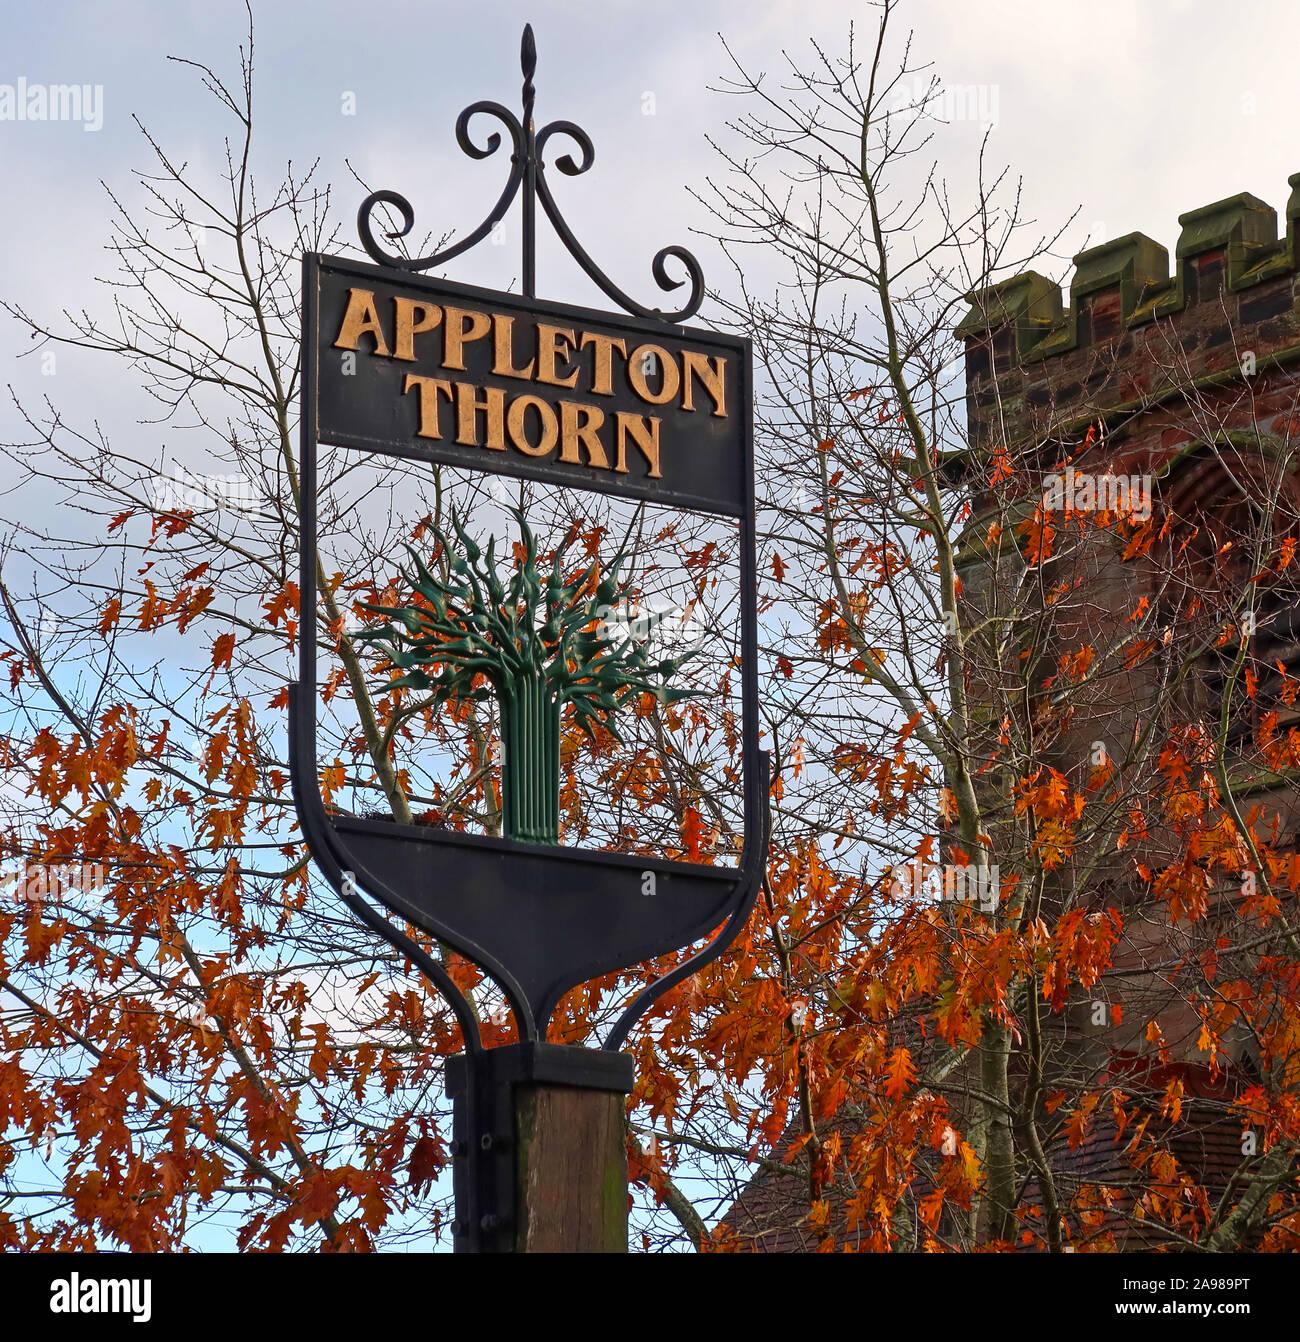 Dieses Stockfoto: Appleton Thorn Ortsschild, grappenhall Lane, South Warrington, Cheshire, England, UK WA4 4QX - 2A989P